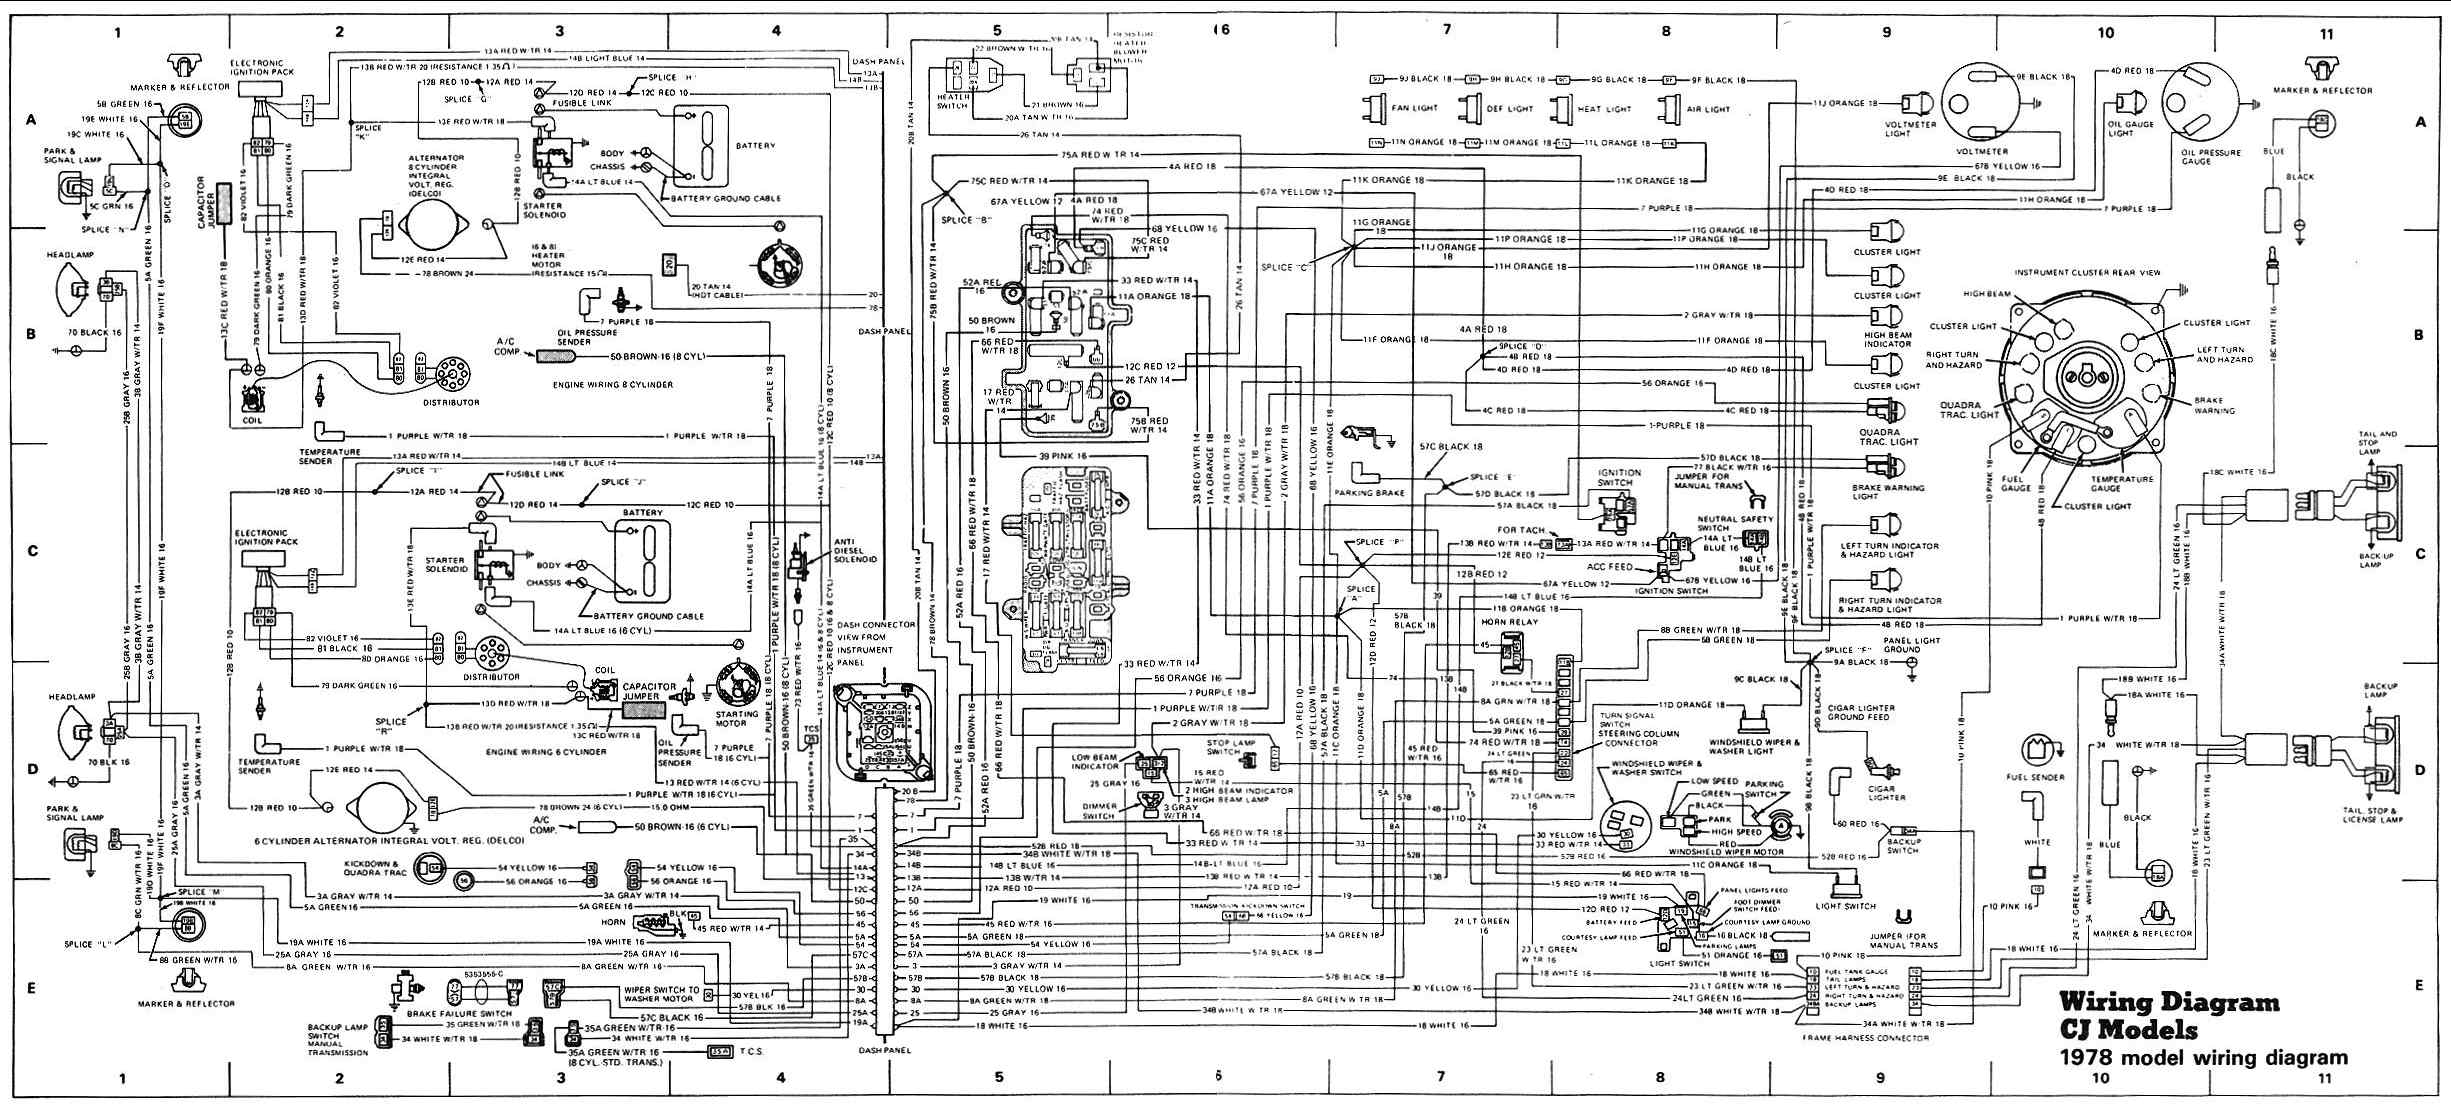 Groovy 1985 Jeep J10 Wiring Harness Wiring Diagram Database Wiring Cloud Ittabpendurdonanfuldomelitekicepsianuembamohammedshrineorg